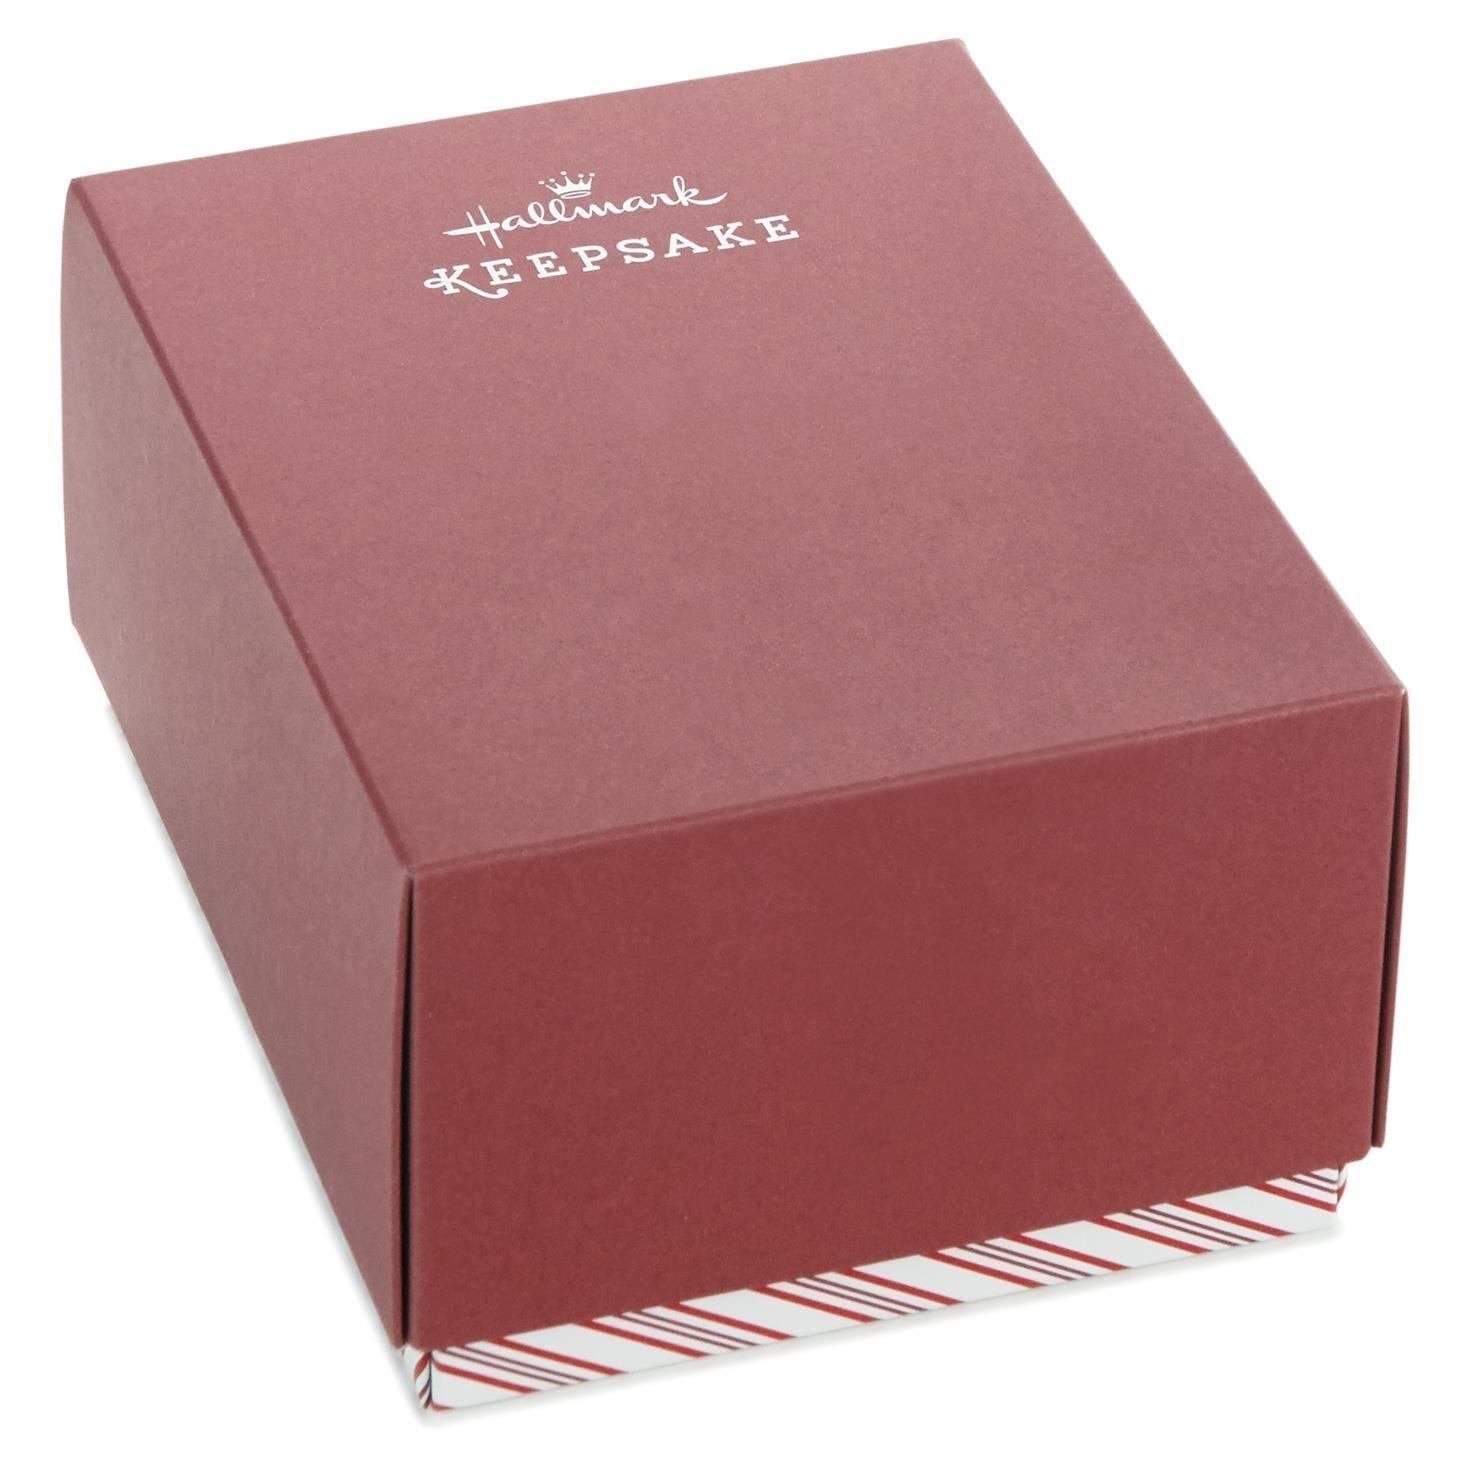 Hallmark Red Bow Tie Penguin Premium Porcelain Ornament